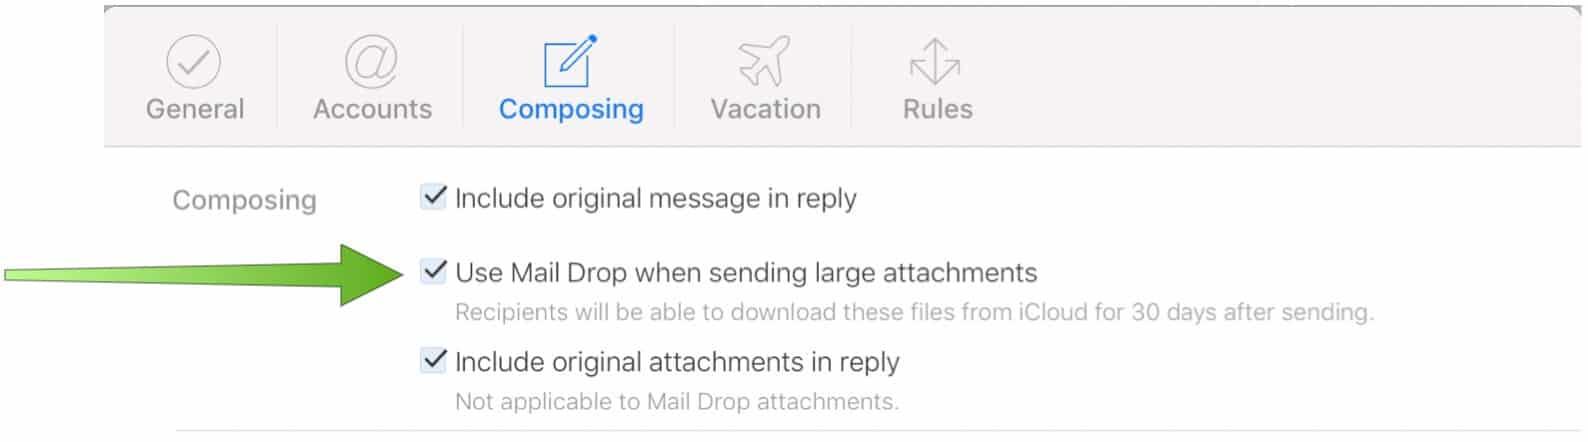 Turn on Mail Drop